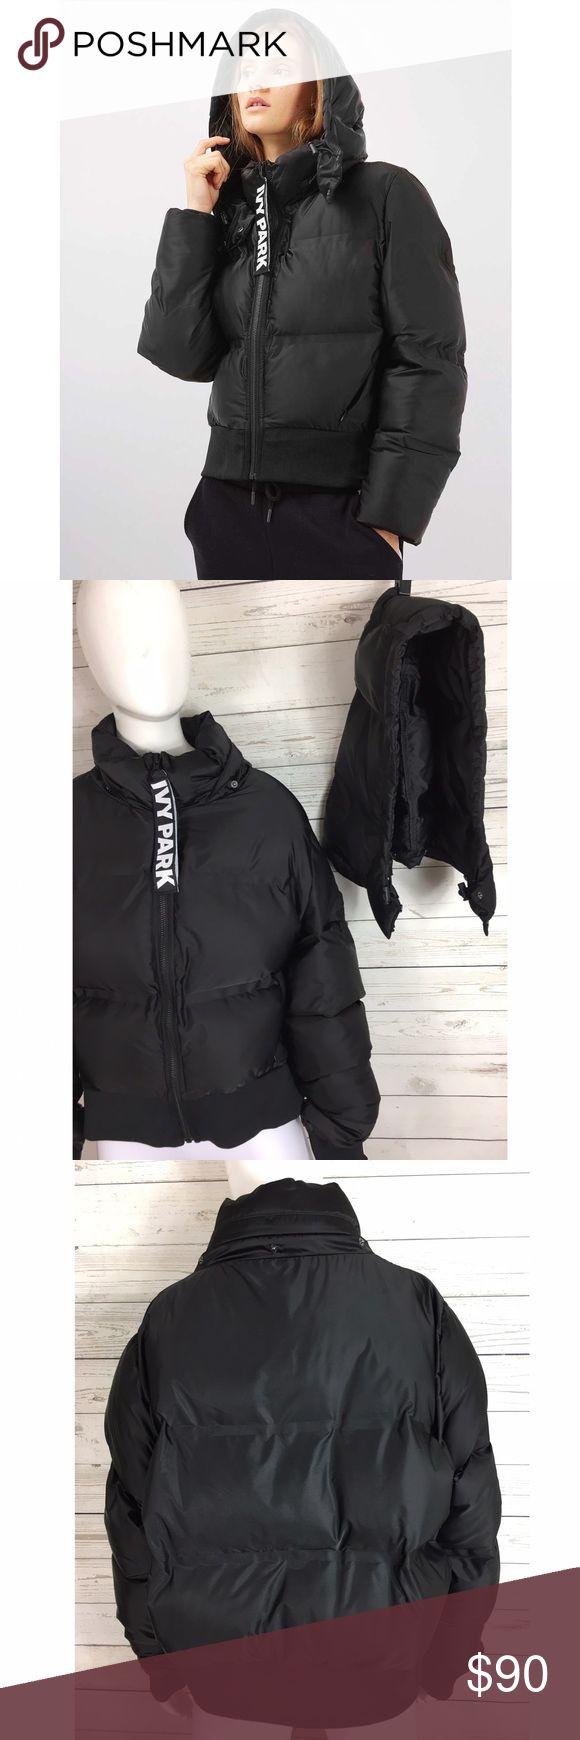 "Ivy Park Black Cropped Puffer Jacket Sz L Detachable hood. Oversized logo zipper pull. 100% polyester. Measurements laid flat; 24"" armpit to armpit. 22"" shoulder to hem. Ivy Park Jackets & Coats Puffers"